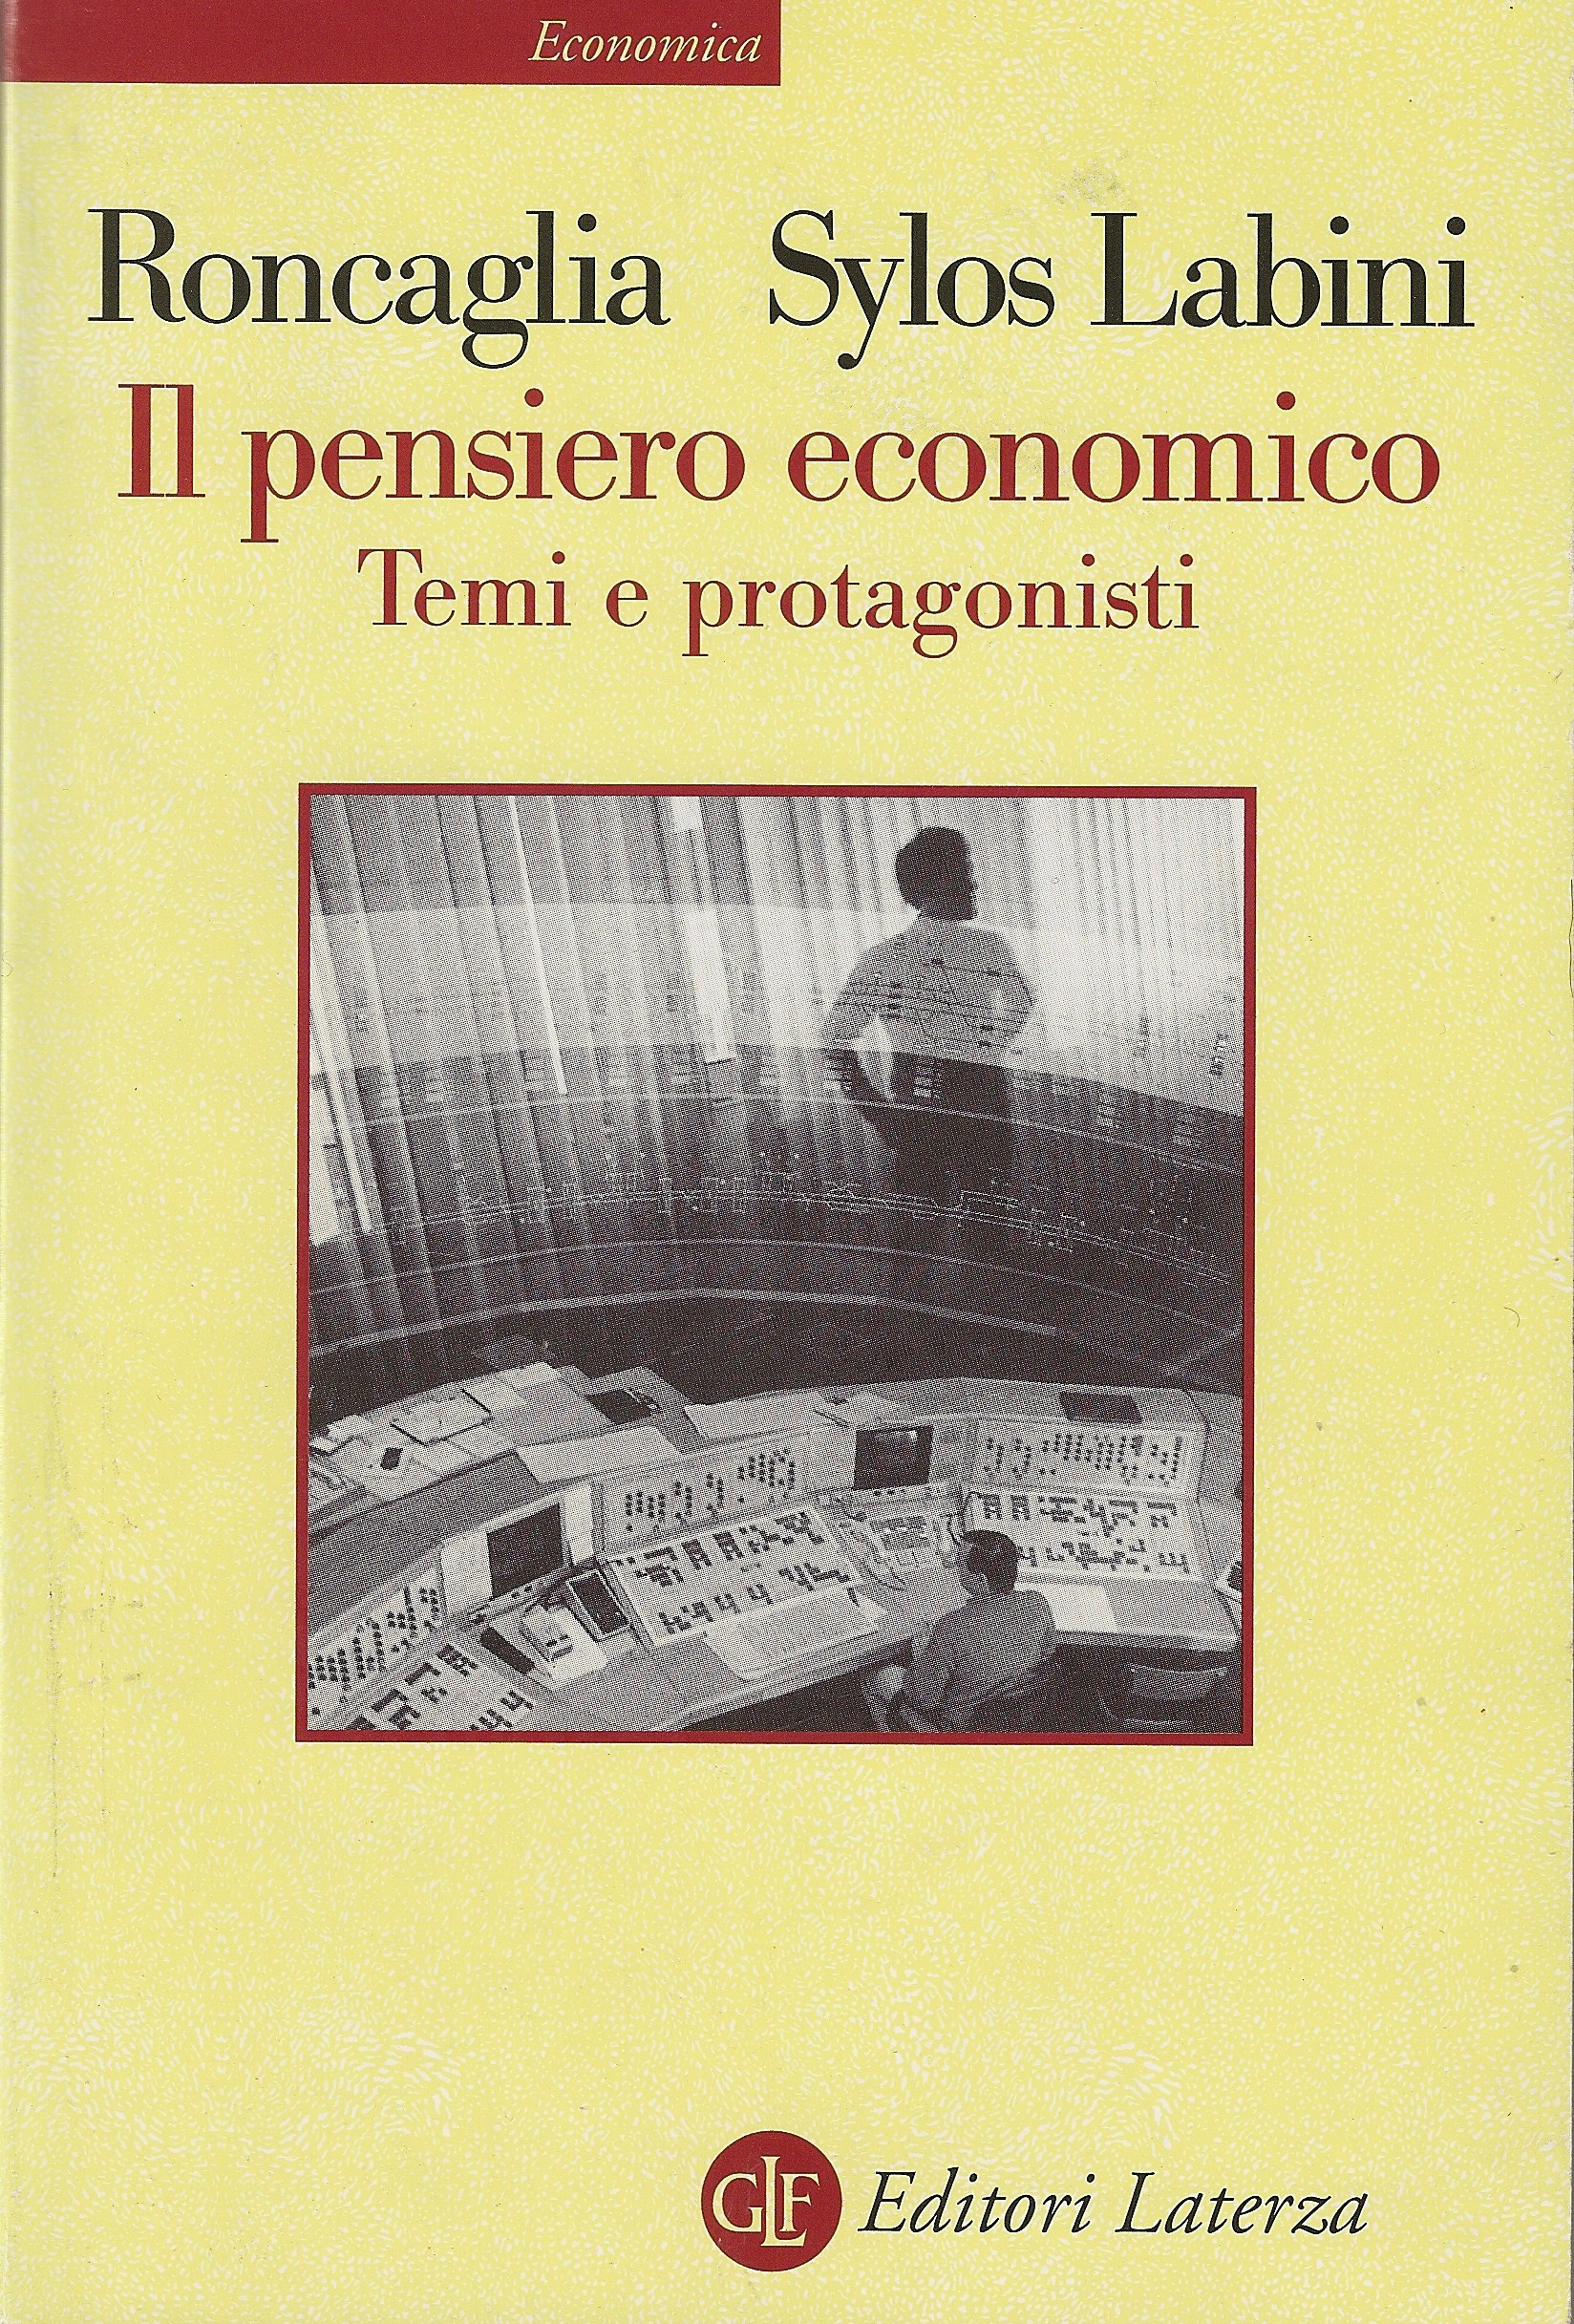 Il pensiero economico